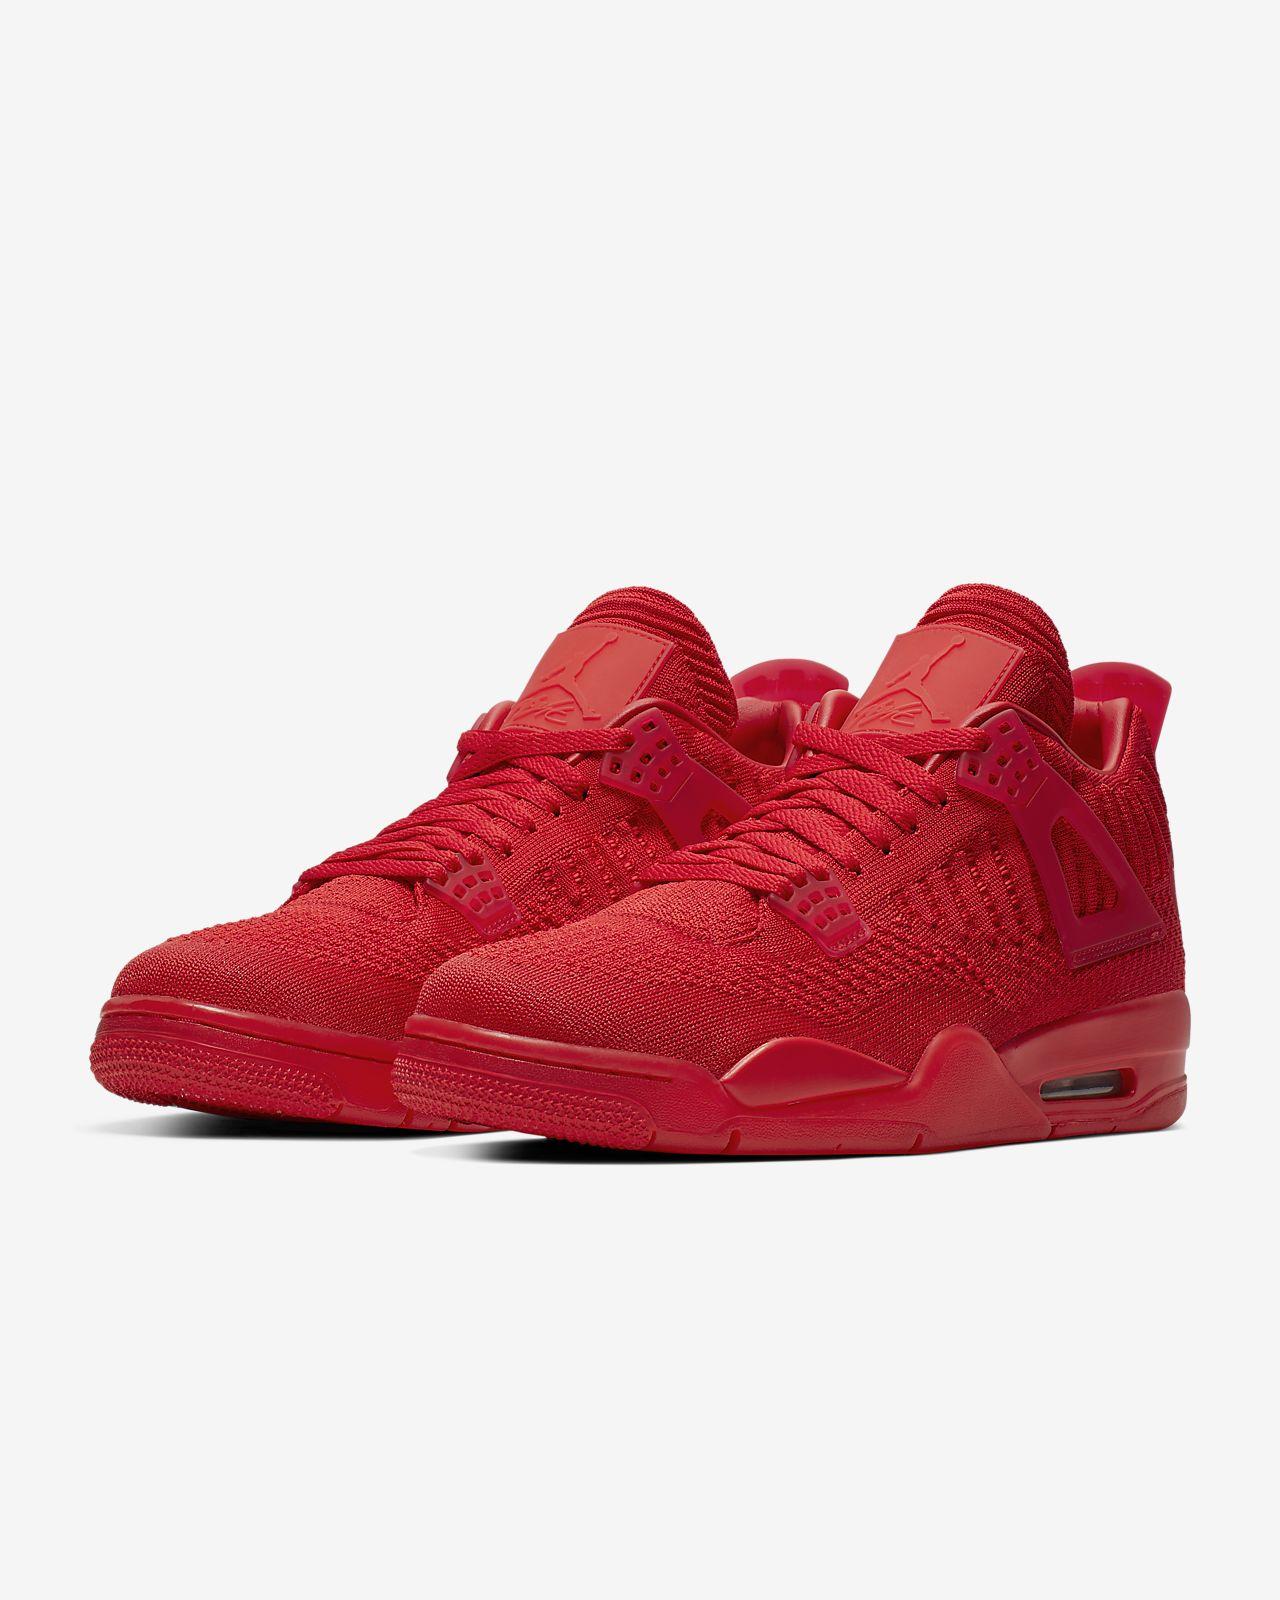 588ea1213b0f7 Air Jordan 4 Retro Flyknit Men's Shoe. Nike.com